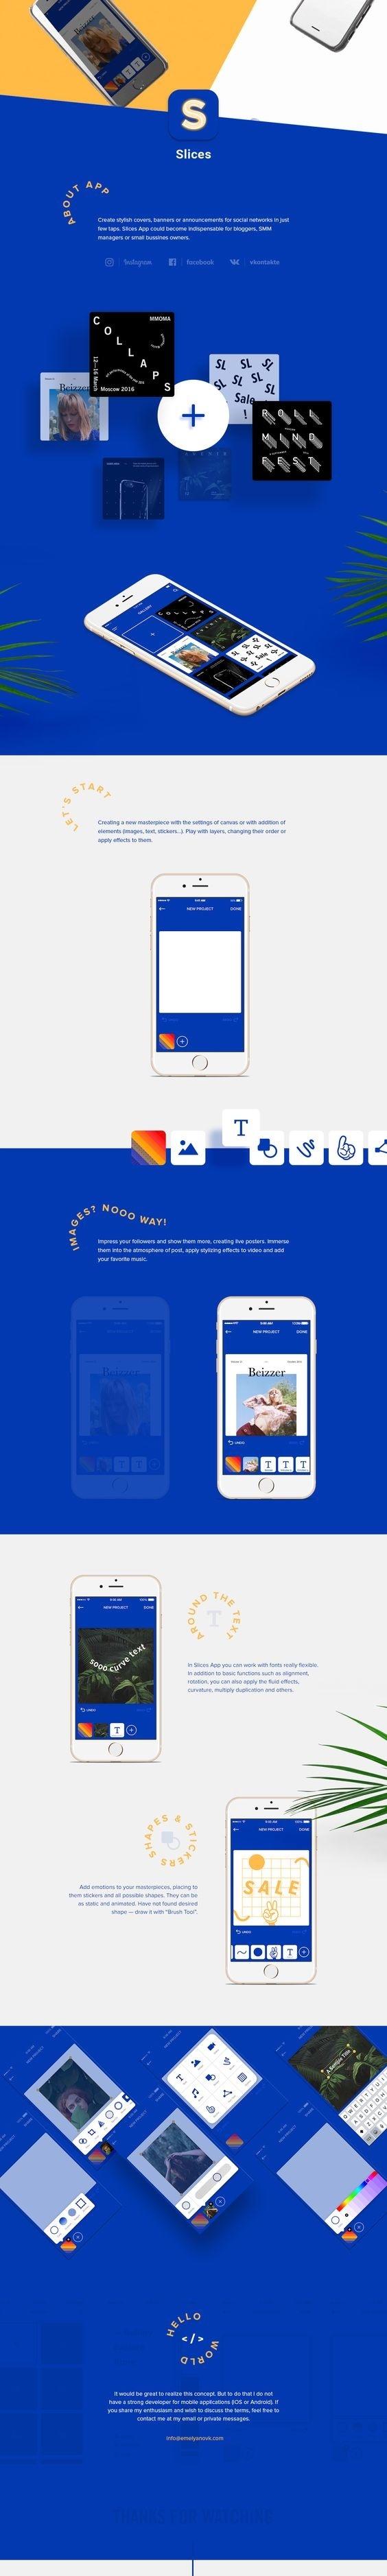 https://www.behance.net/gallery/38479067/Slices-App-SMM-Banner-Maker-for-iOS #app #mobile #ios #editor #photoshop #minimalism #menu #sideba